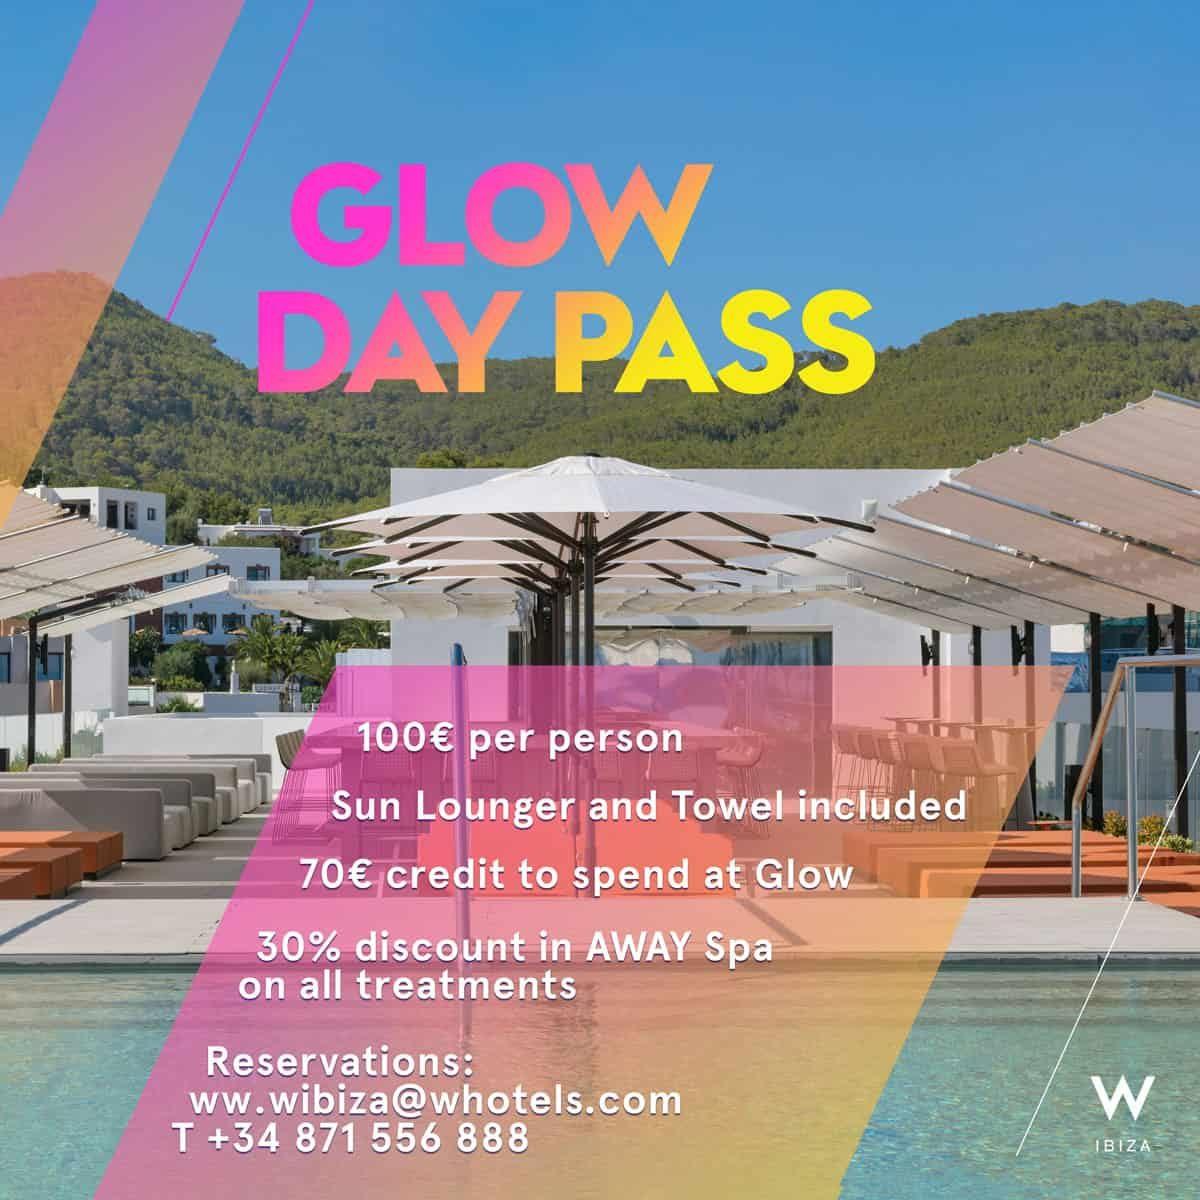 glow-day-pass-w-ibiza-hotel-2021-welcometoibiza